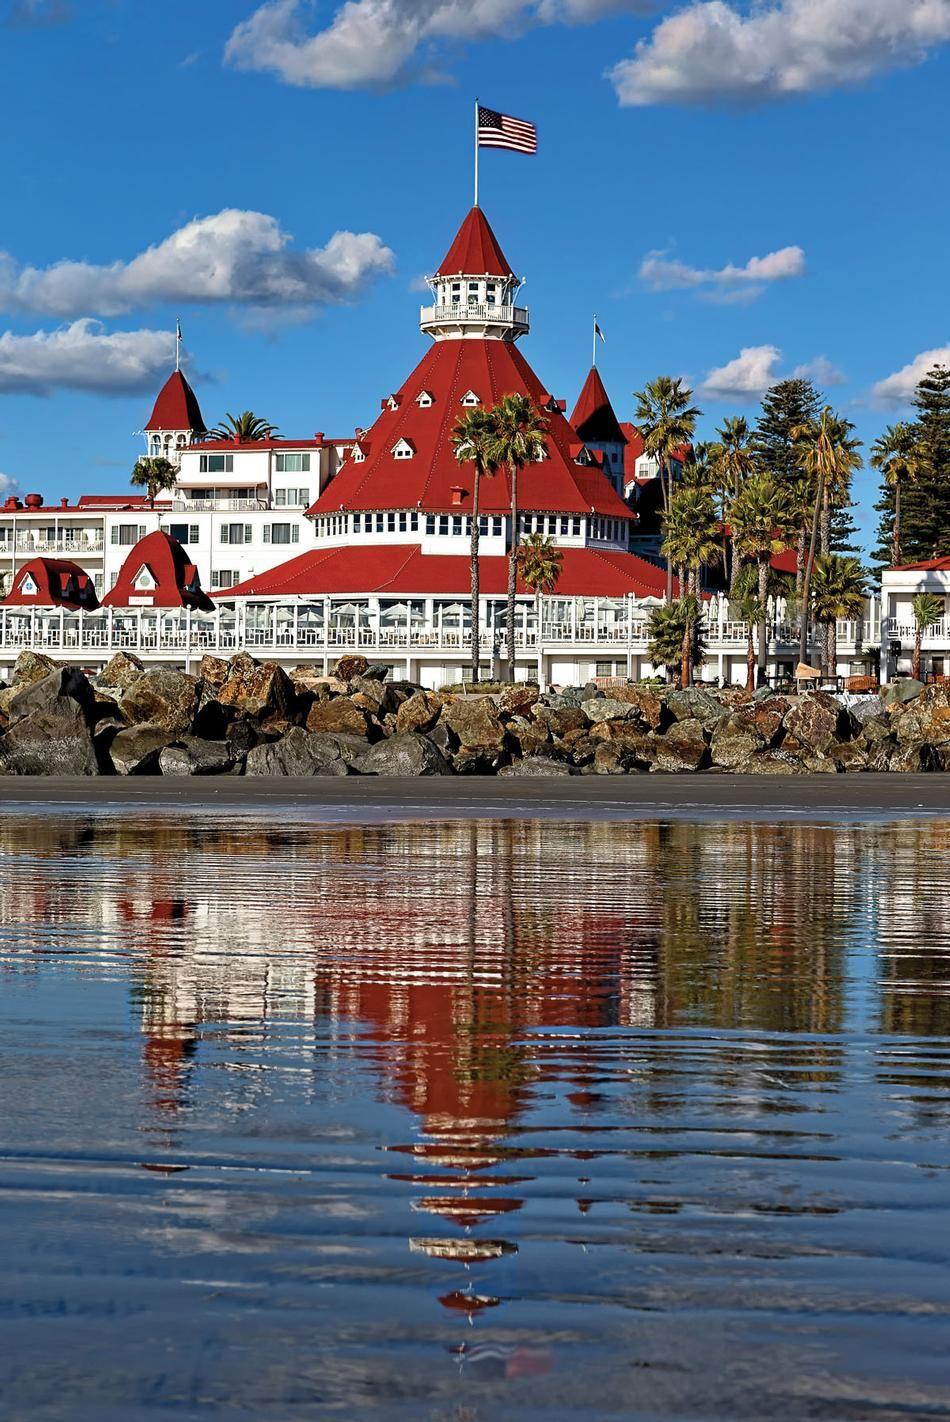 Del Coronado Hotel In San Diego. Spent Week